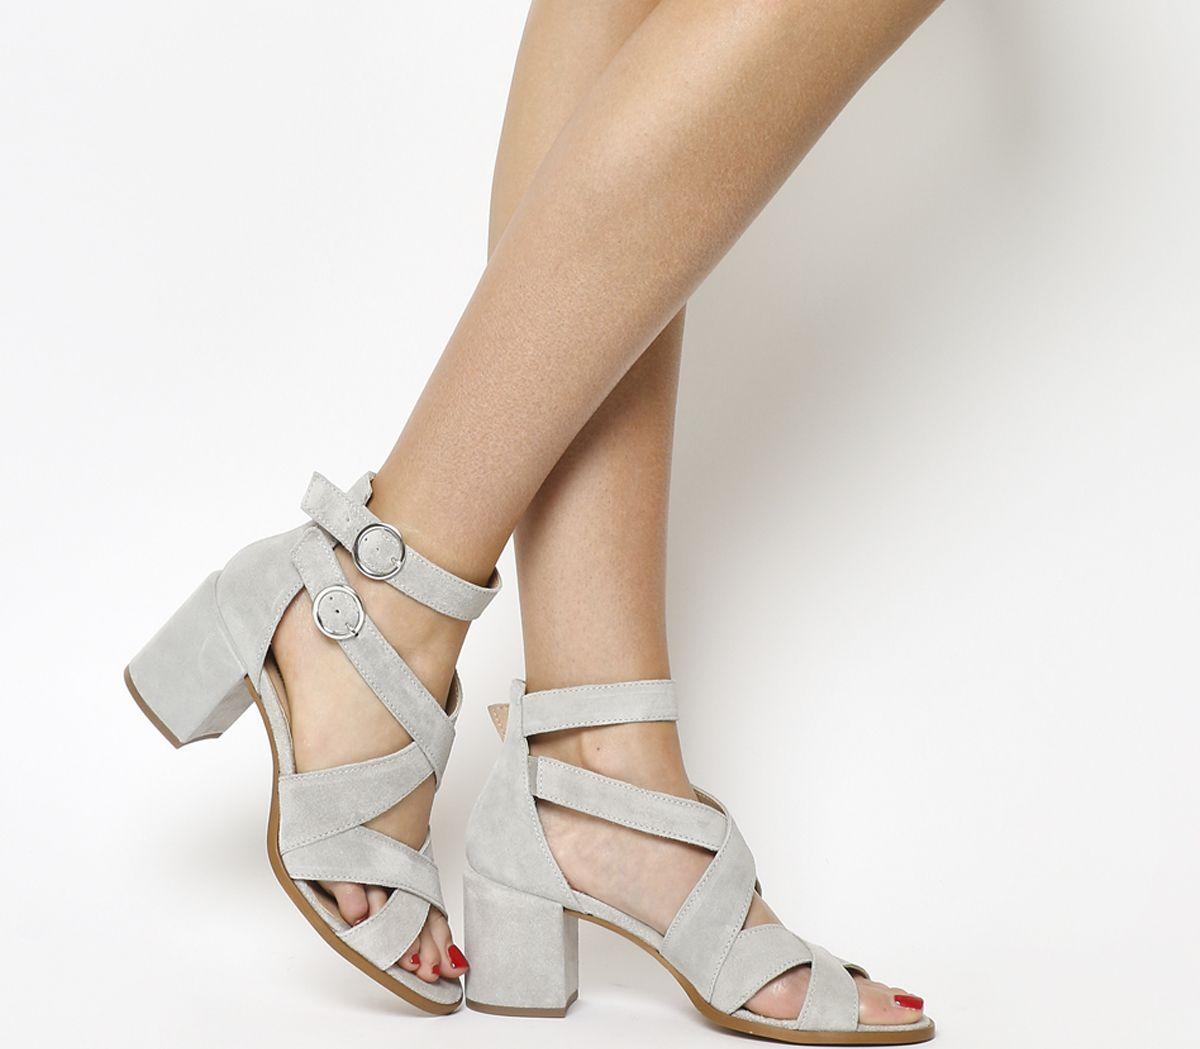 ca6ca96715 Office Market Cuff Block Heel Sandals Grey Suede - Mid Heels